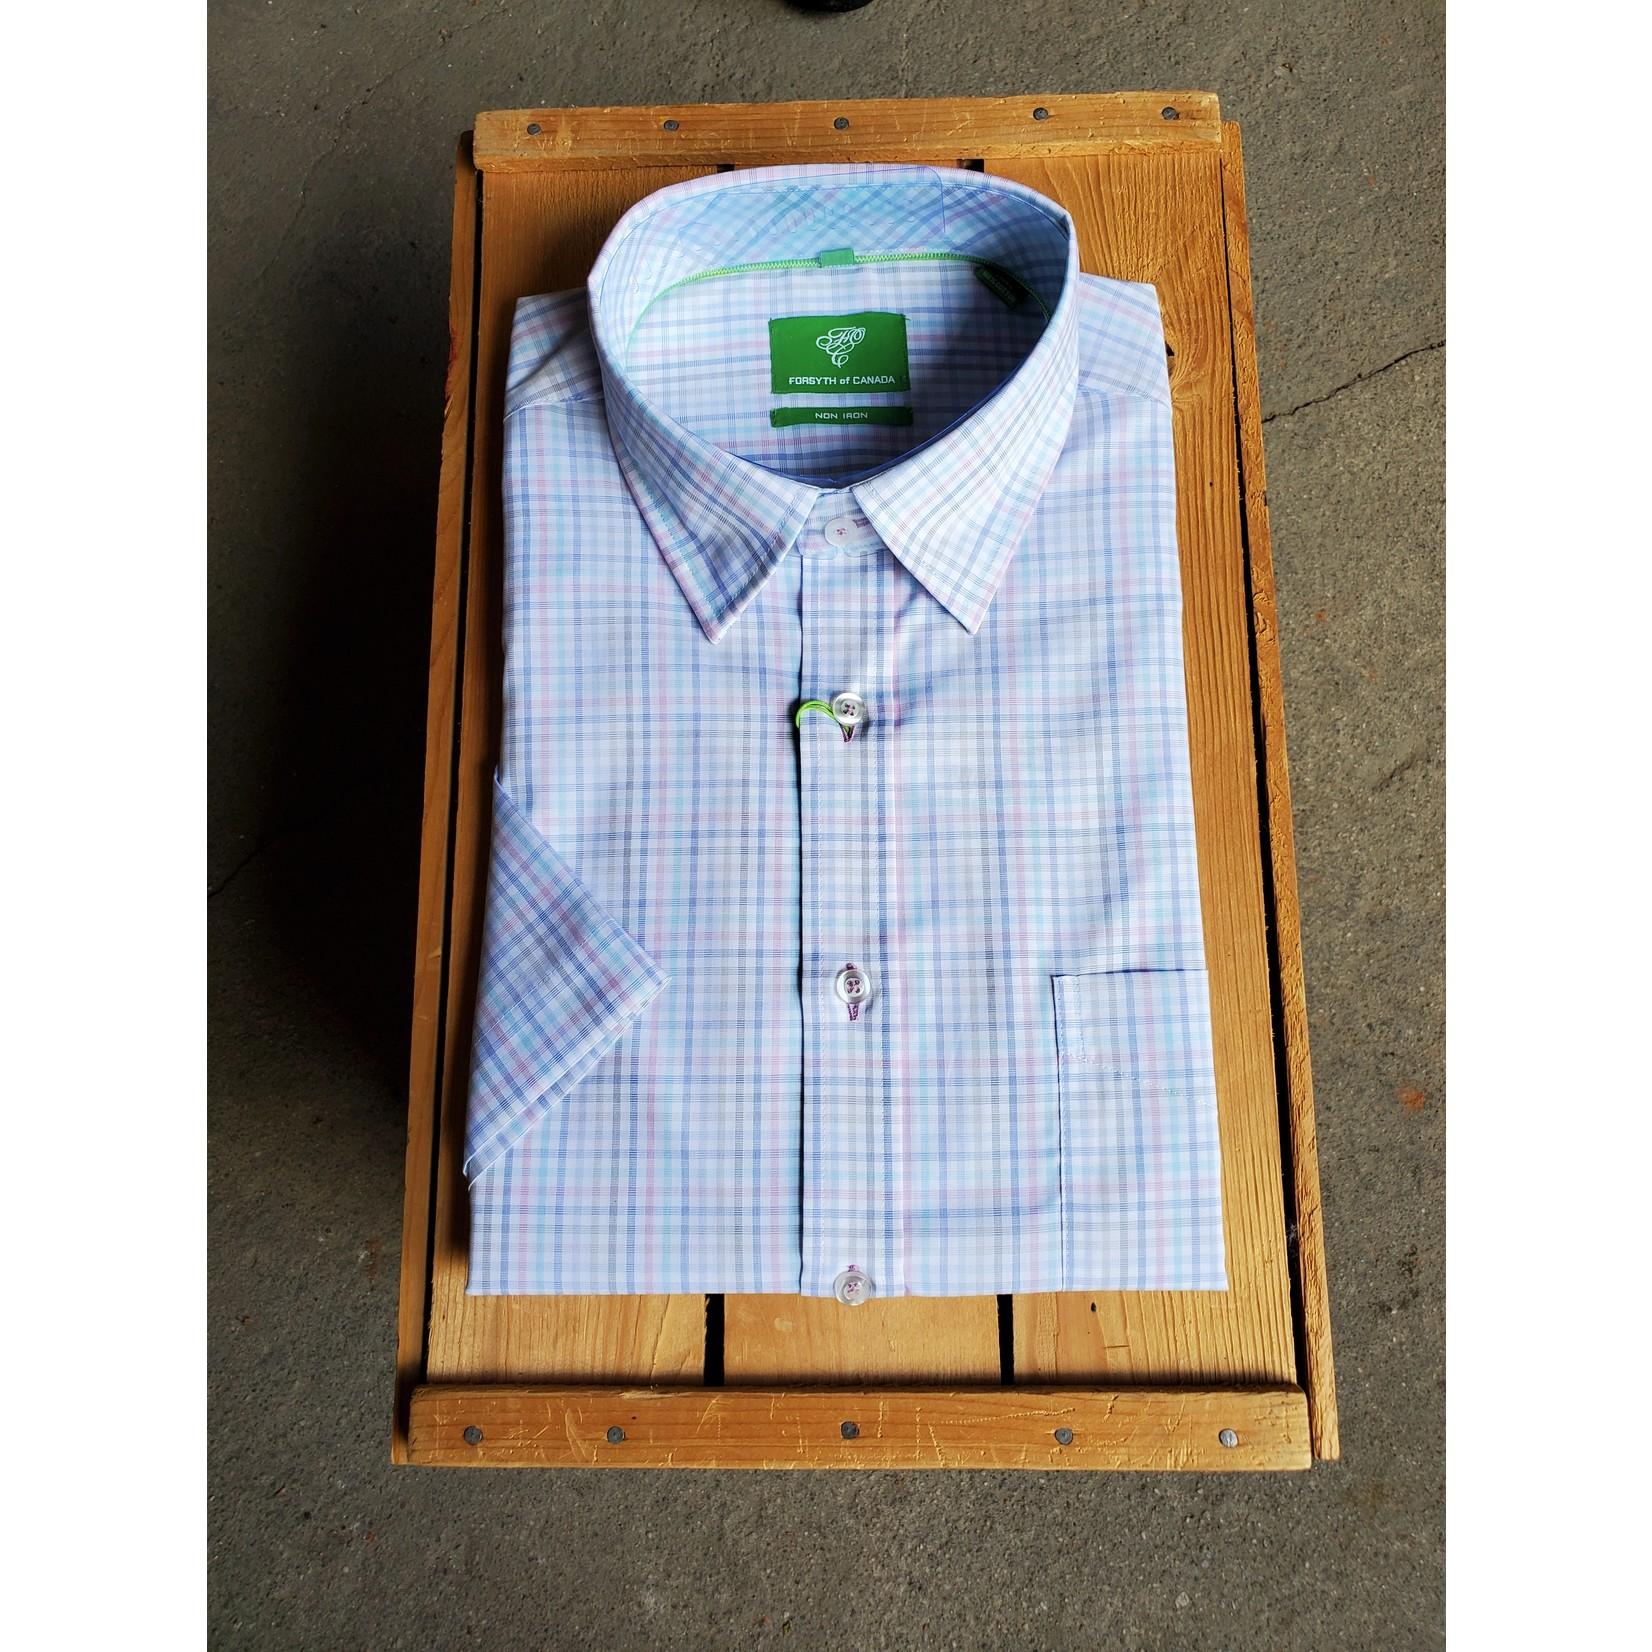 Forsyth Forsyth 8712S Yarn-Dyed End On End Check Short-Sleeve Shirt MIS Mist